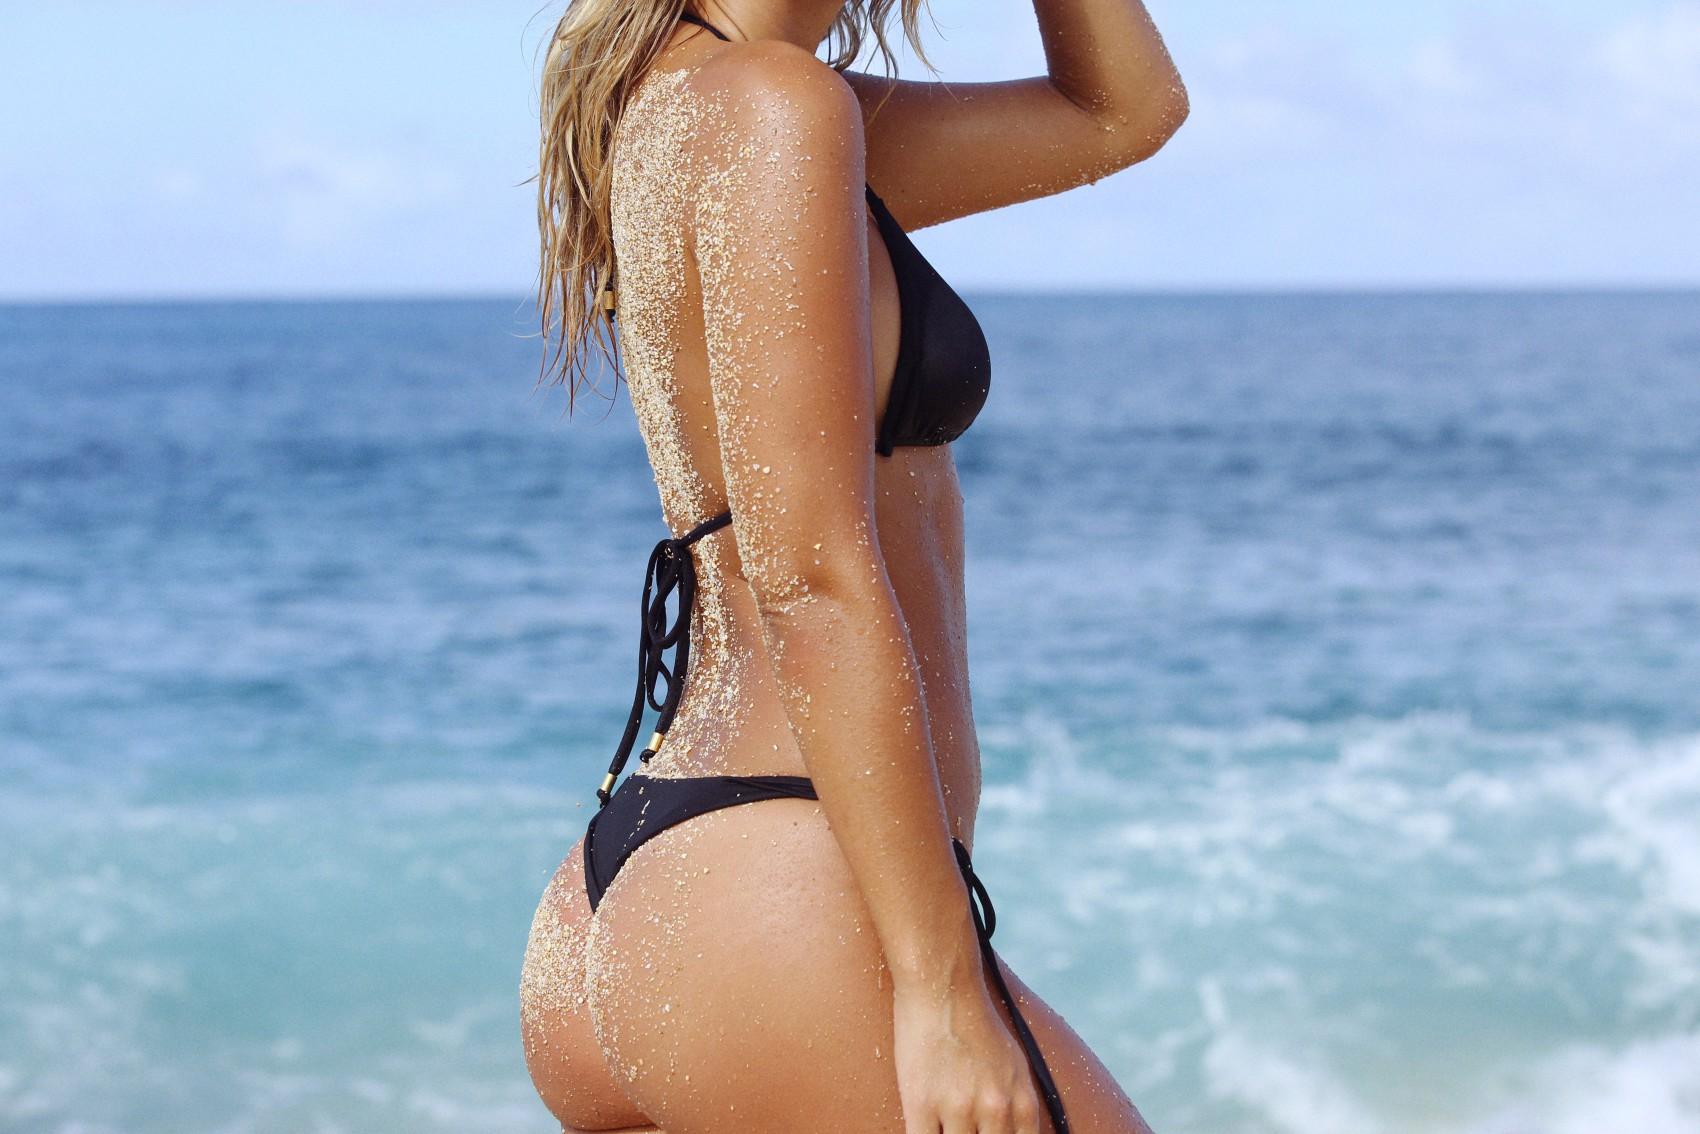 Natasha Oakley 2015 : Natasha Oakley in Little Black Bikini -07